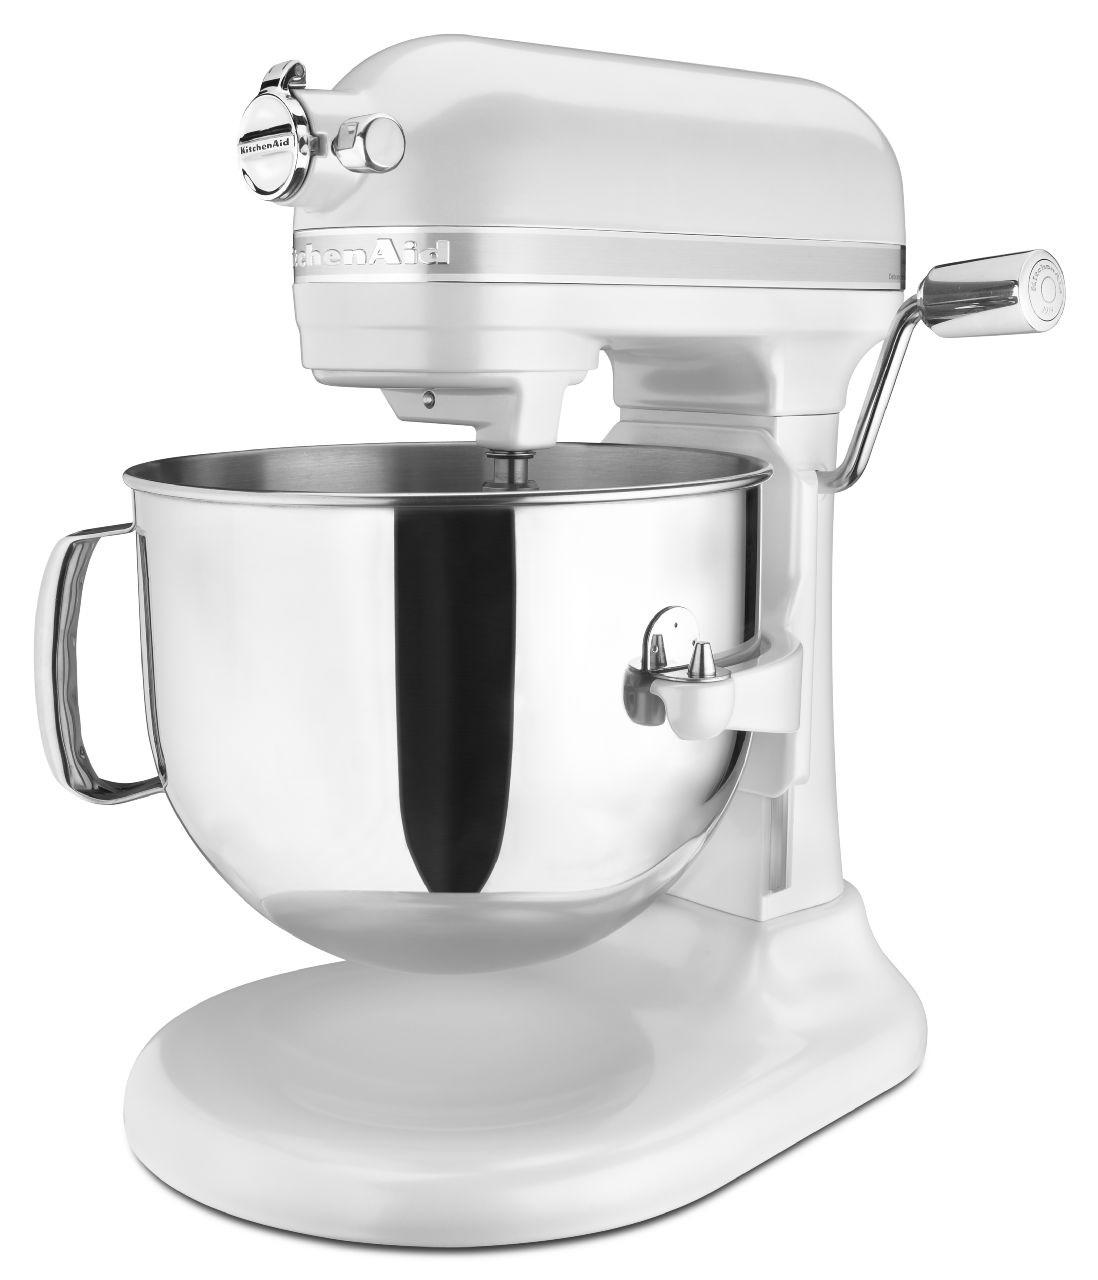 Refurbished KitchenAid 7 Qt Bowl Lift Stand Mixer 883049289717 | eBay